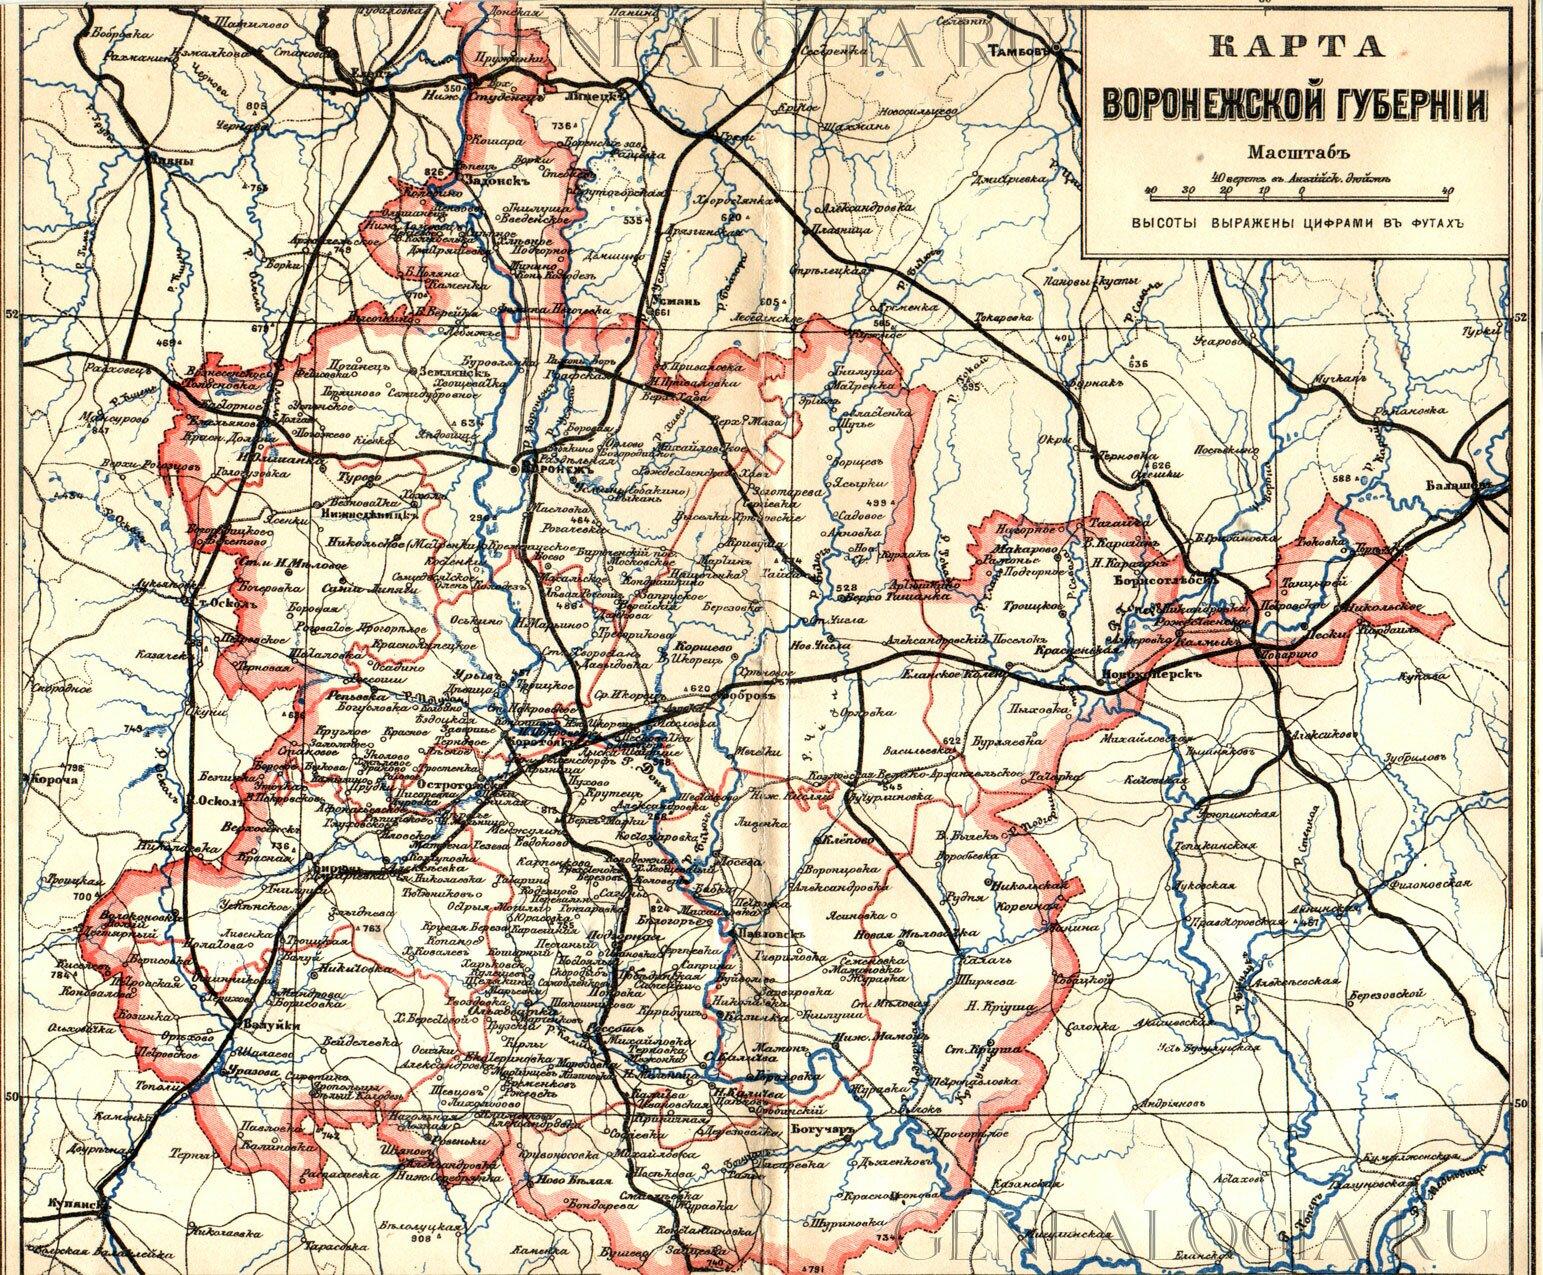 Бирюченский Уезд Карта